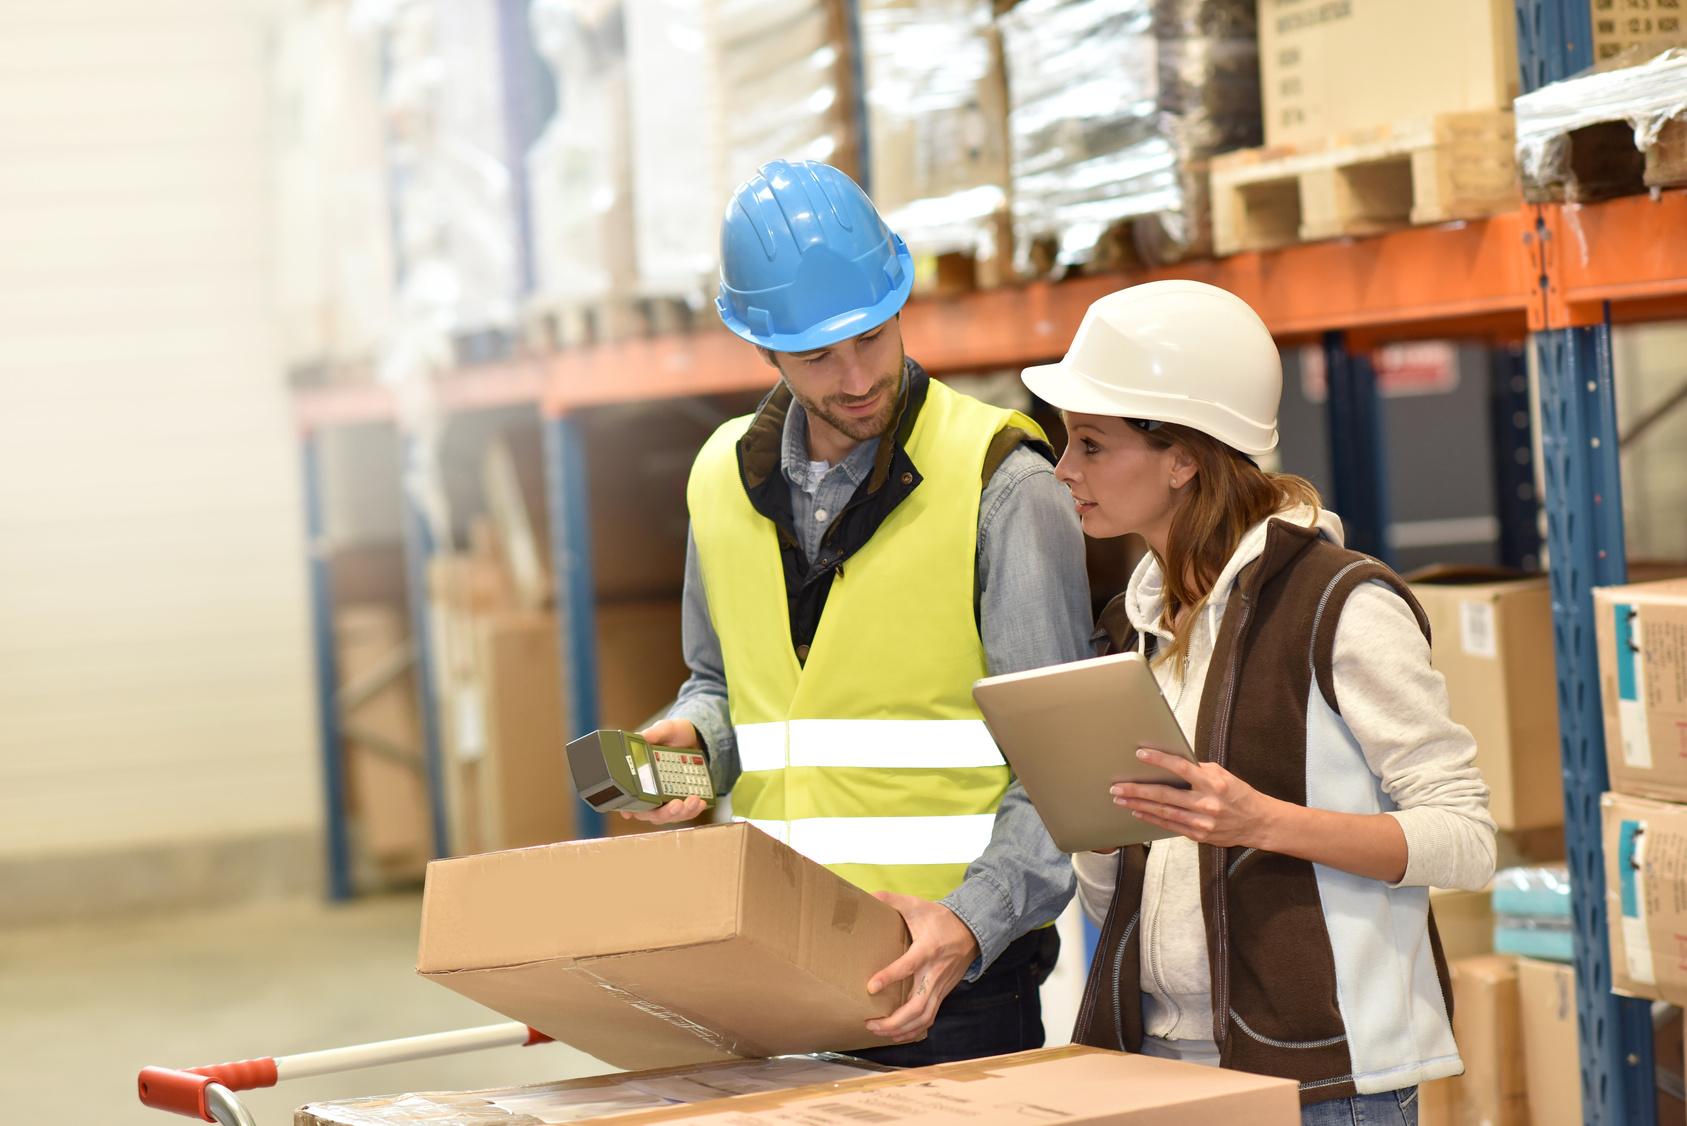 Staplerfahrer Kuriere Logistikmitarbeiter Lagerhelfer Verpacker Produktionshelfer LKW Fahrer Osteuropa